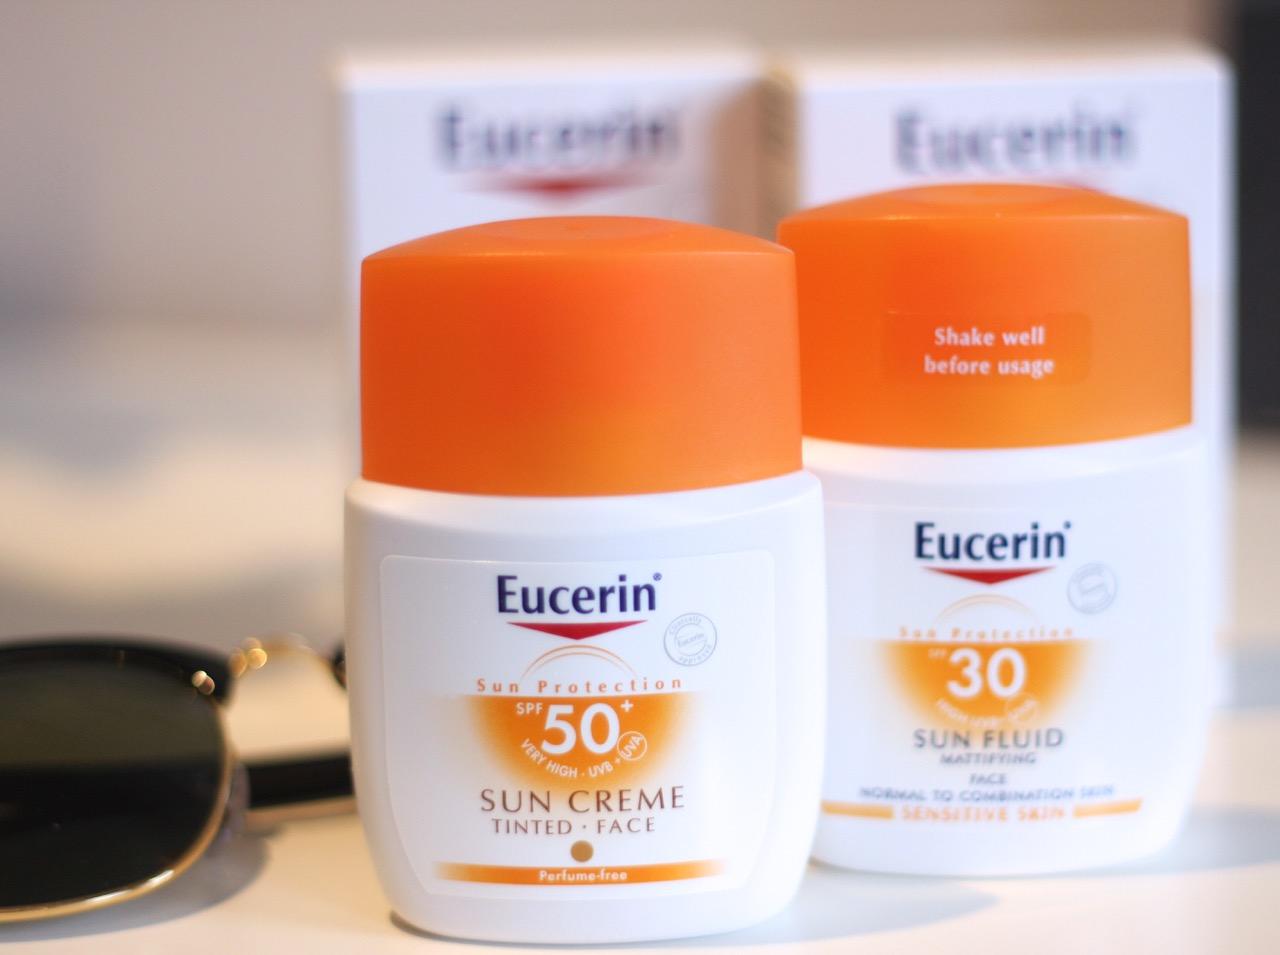 eucerin sun fluid mattifying face spf 30